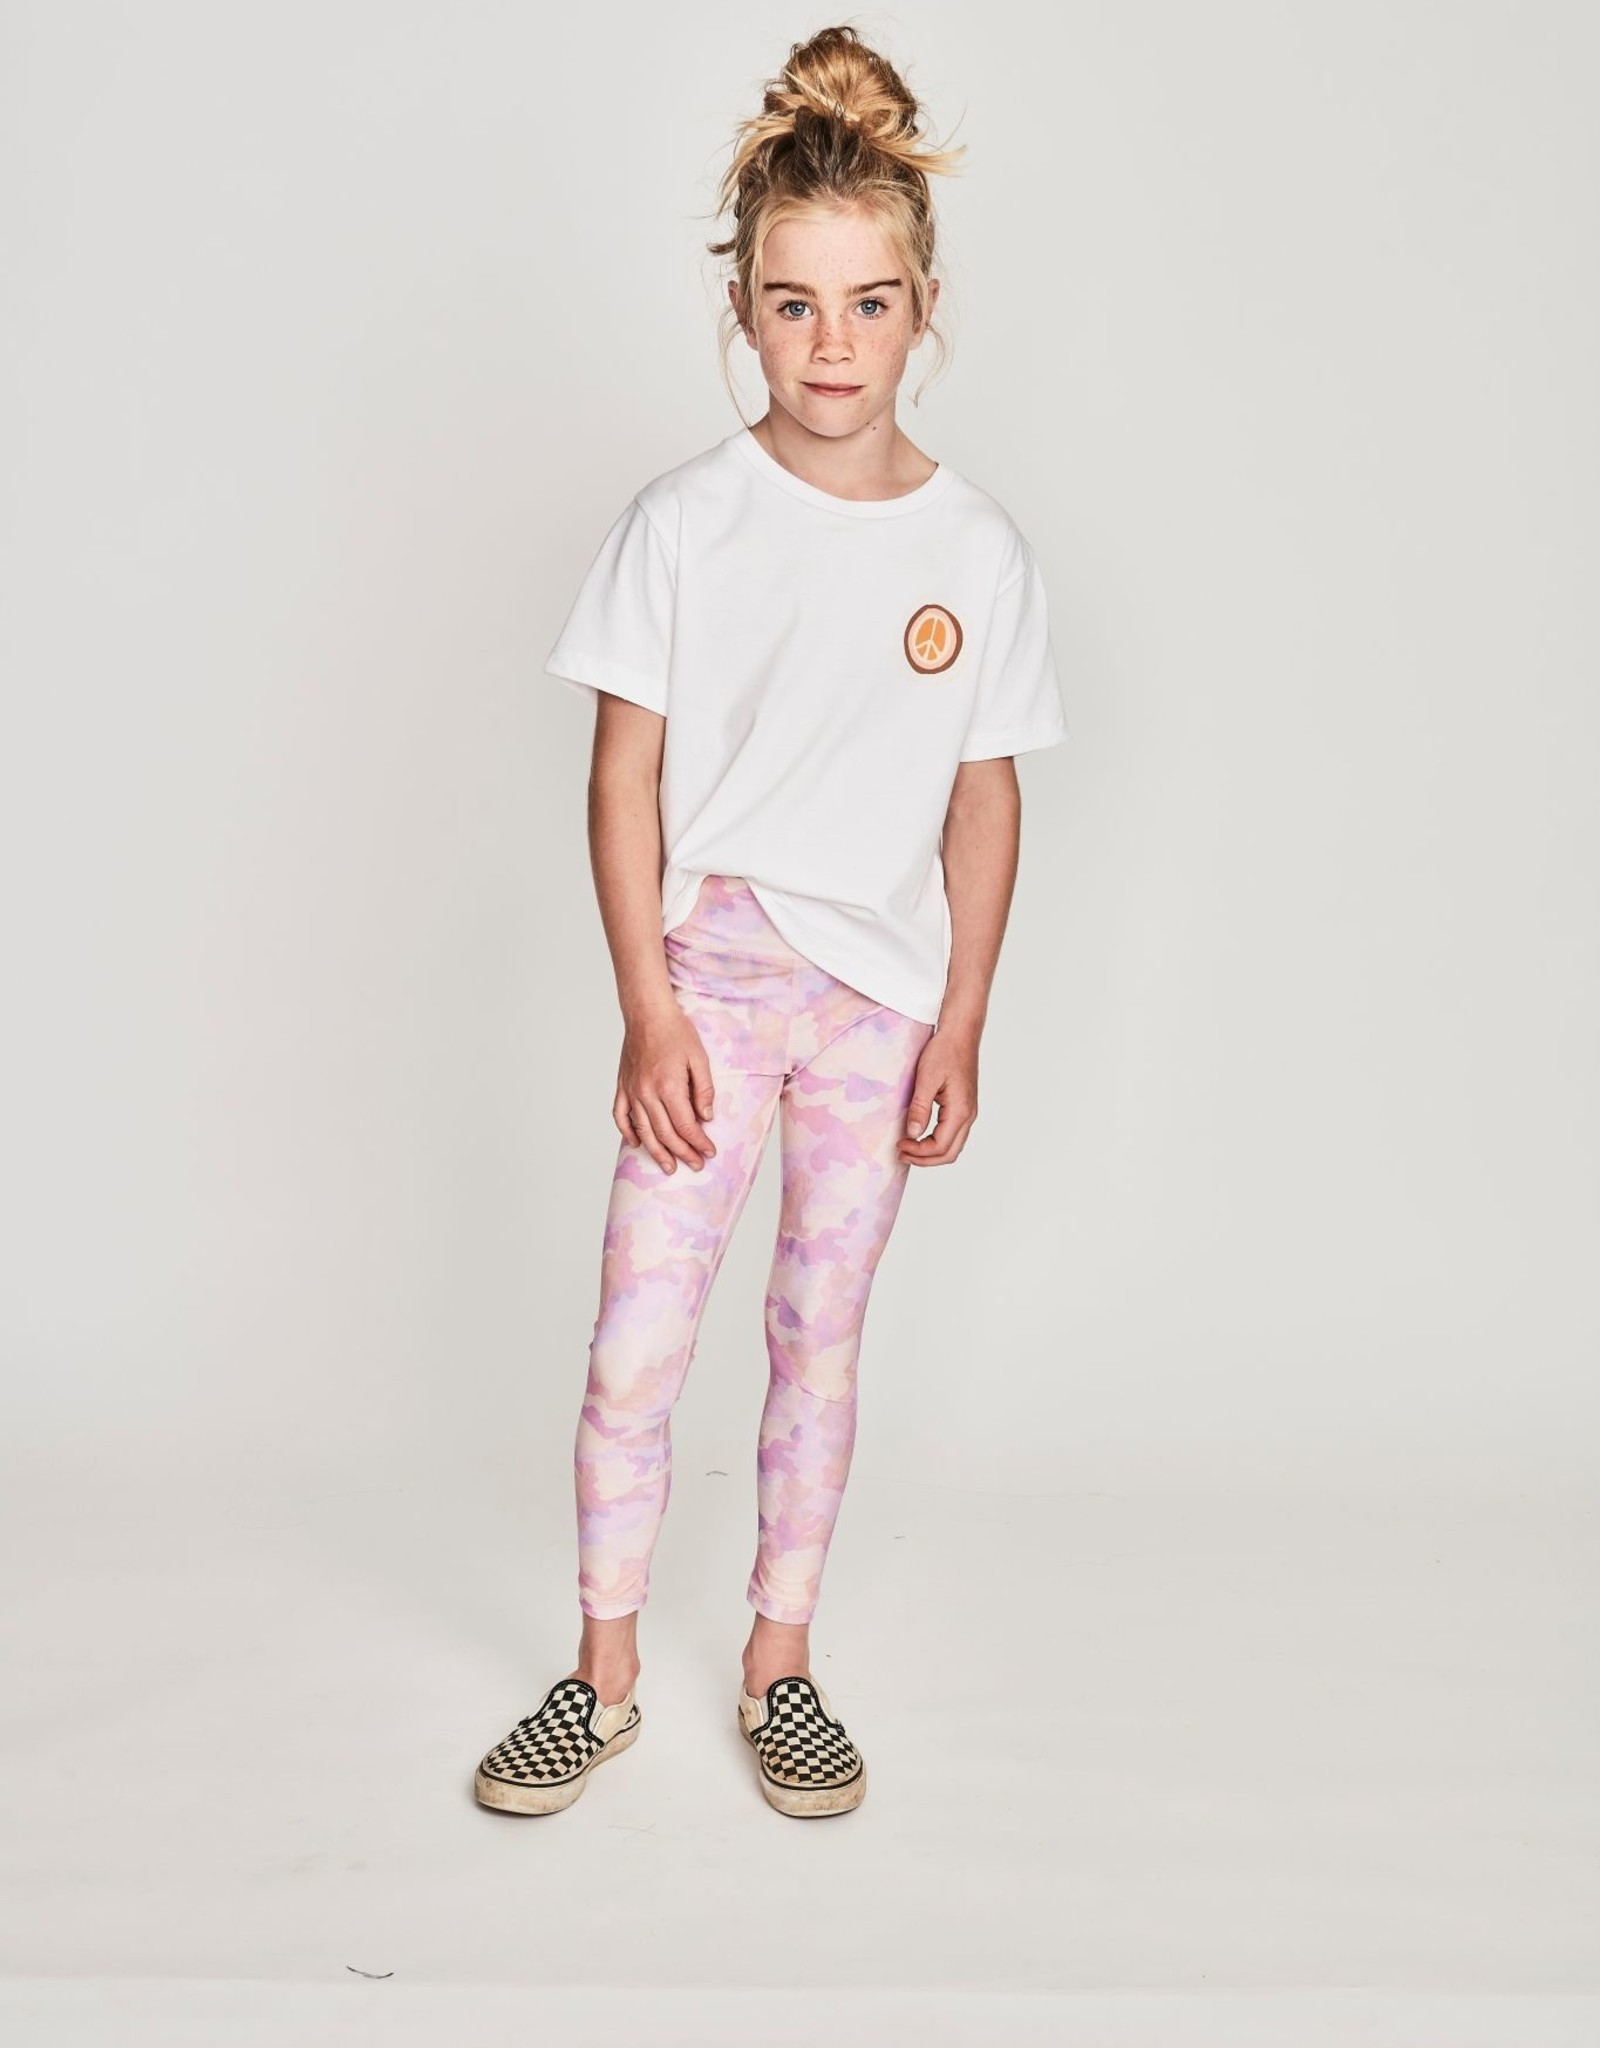 Munster Kids rose leggings- camo